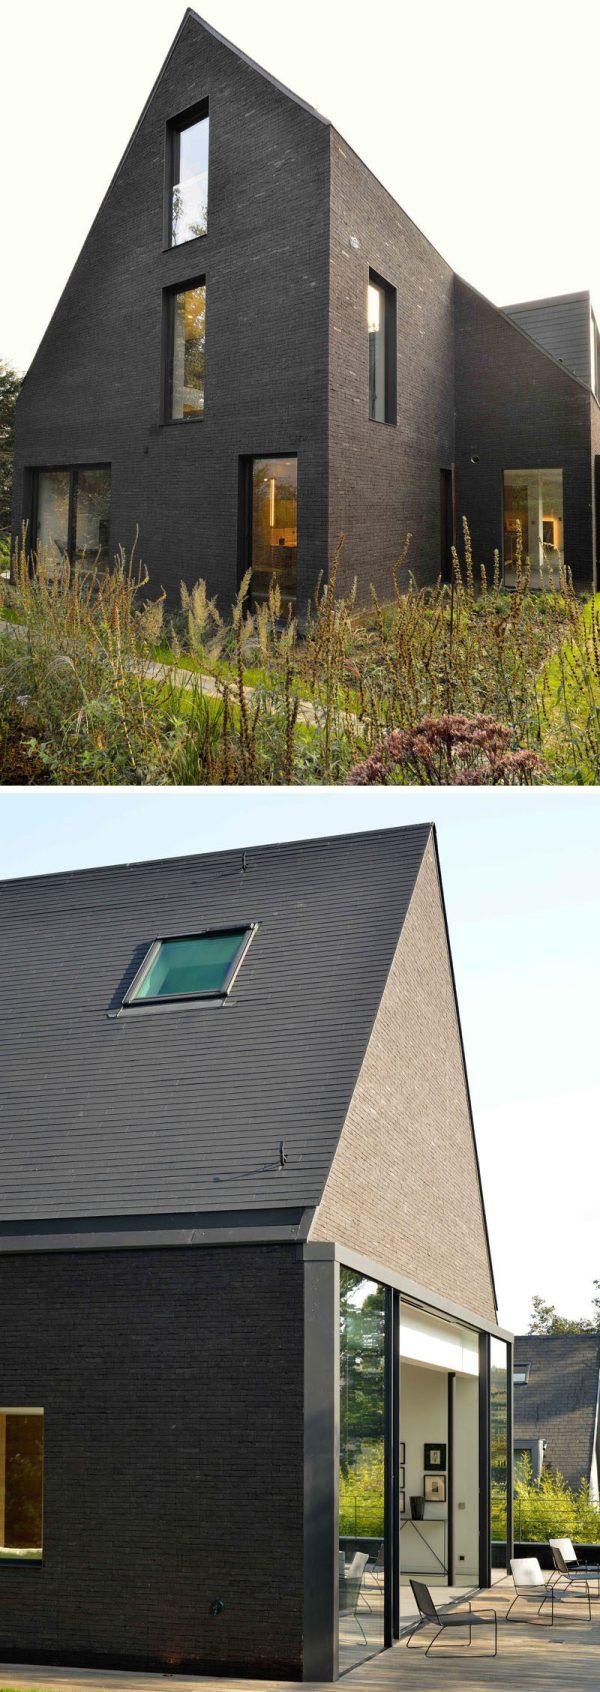 Contemporary Black Brick House Renovated